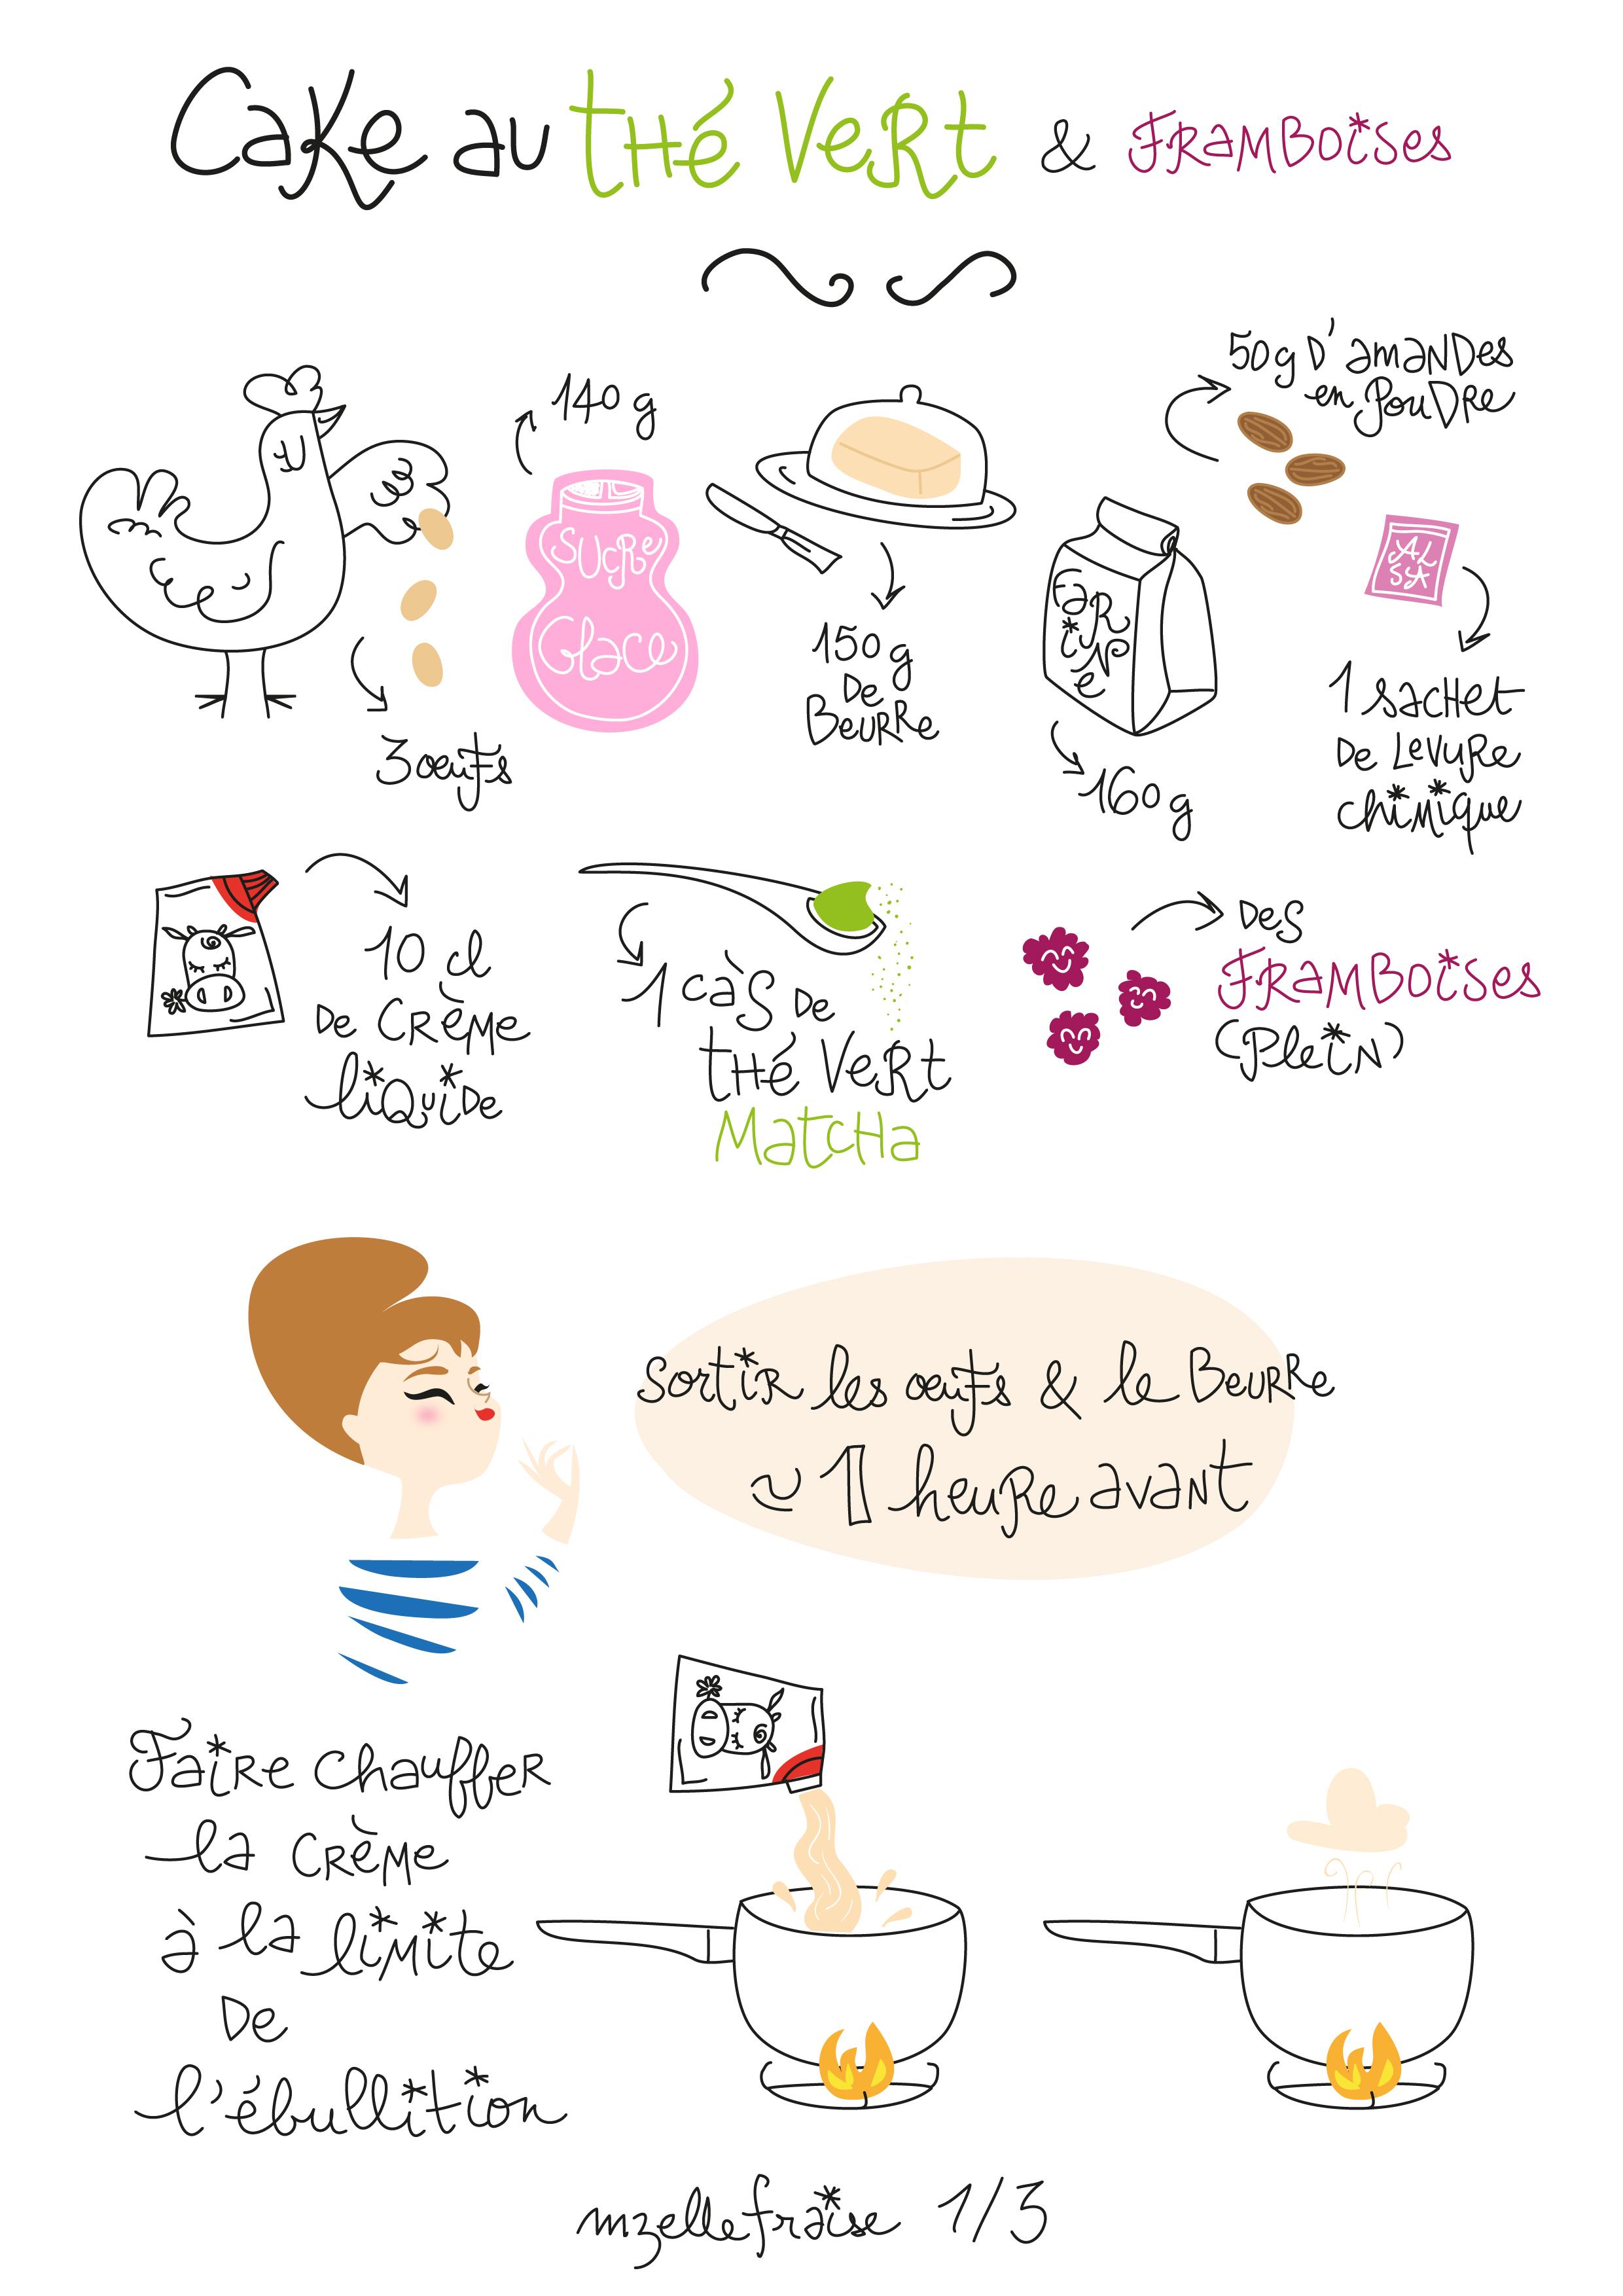 Recette illustr e cake au th vert et framboises - Recette laurent mariotte aujourd hui ...